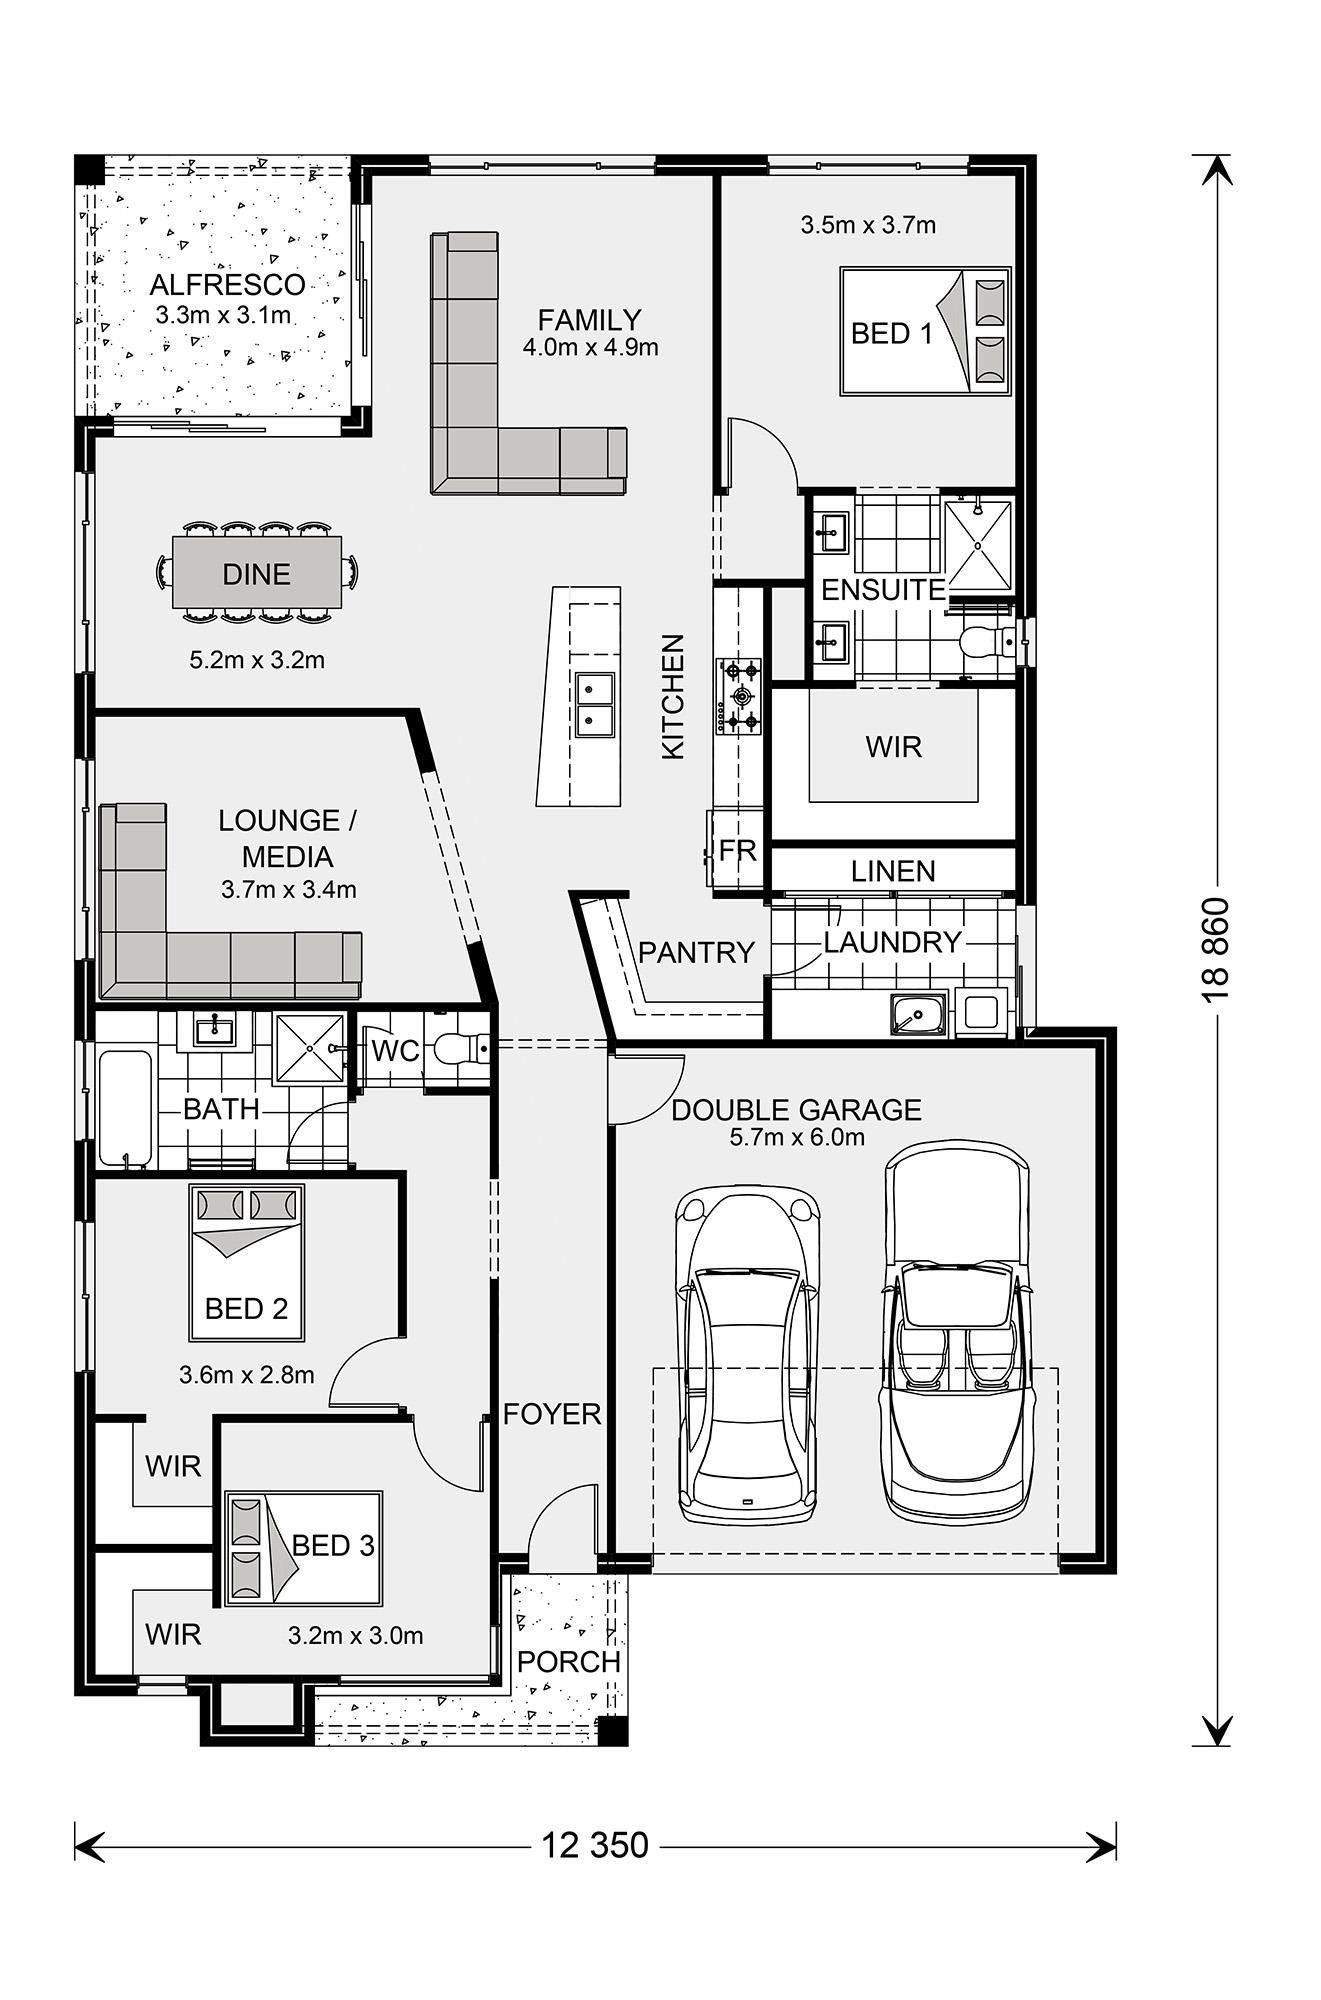 Beachlands 270 Design Ideas Home Designs In G J Gardner Homes House Floor Plans Floor Plans House Plans